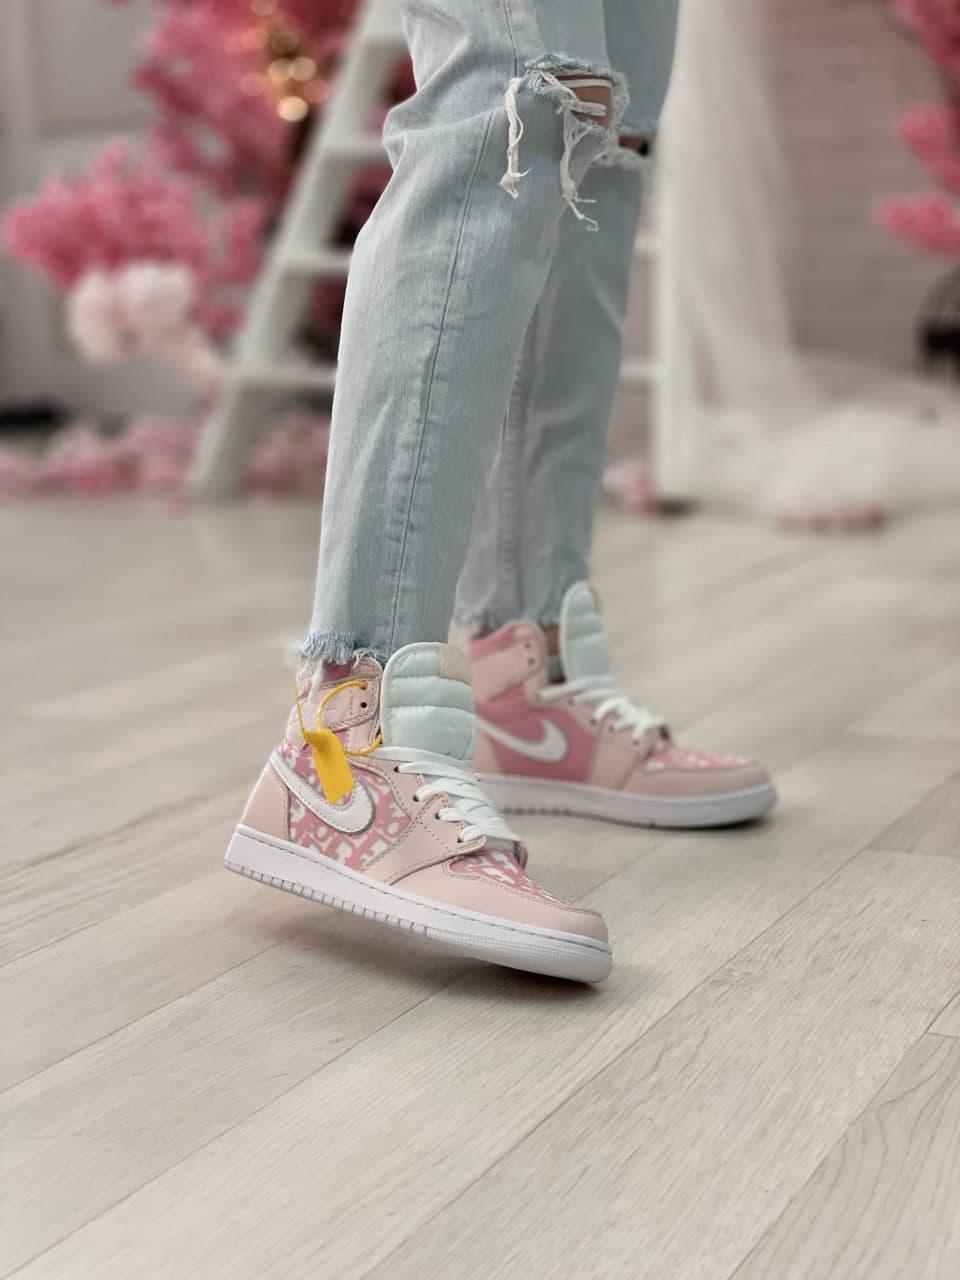 Air Jordan 1 Retro x Dior Grey (Топ качество) Осень-Весна, Жіночі Кросівки, Женская обувь